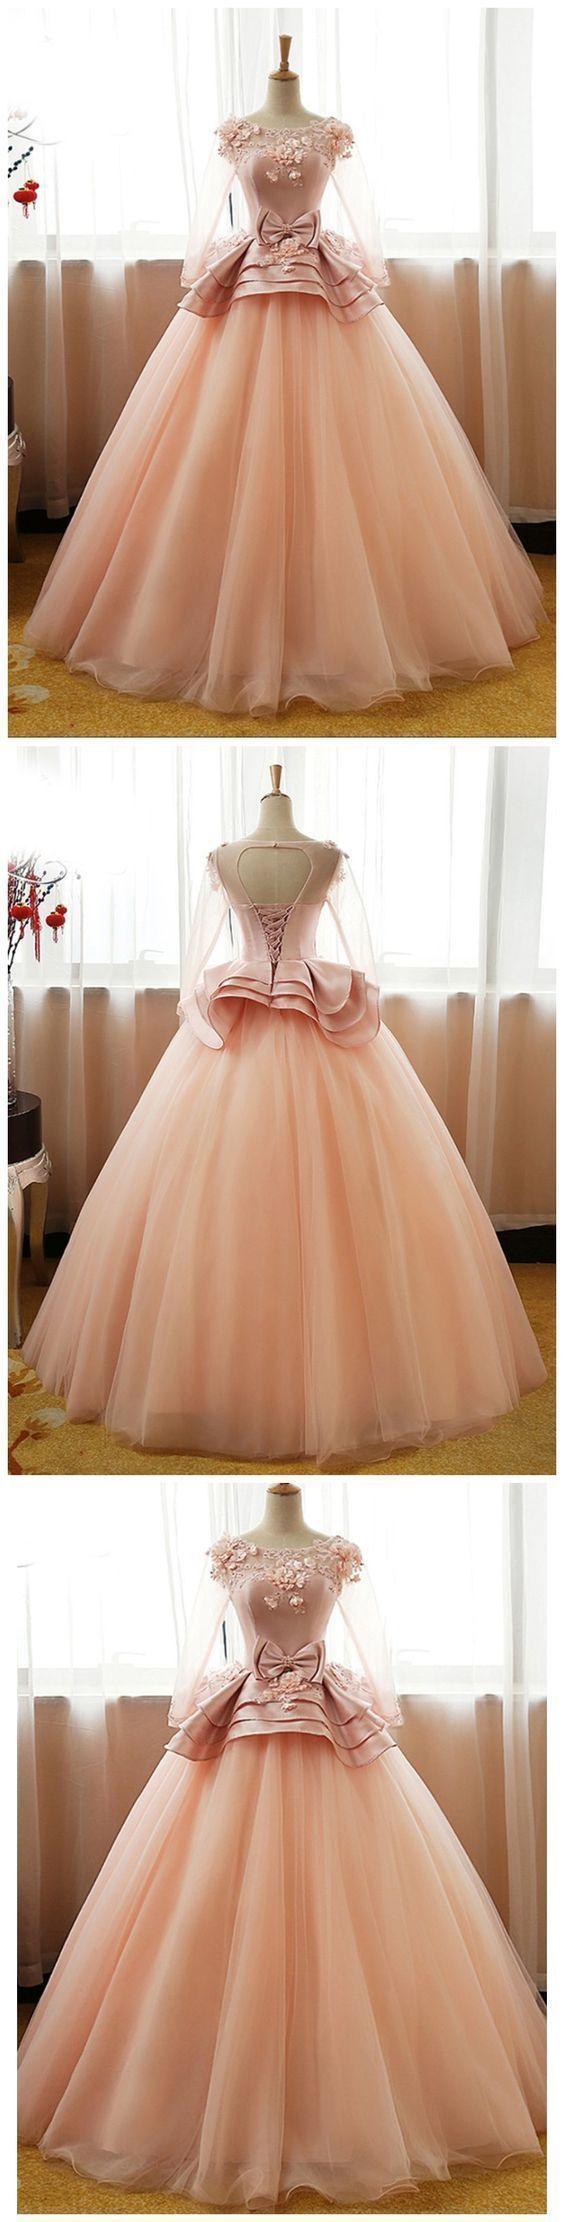 Long Sleeve Applique Beaded Prom Dresses